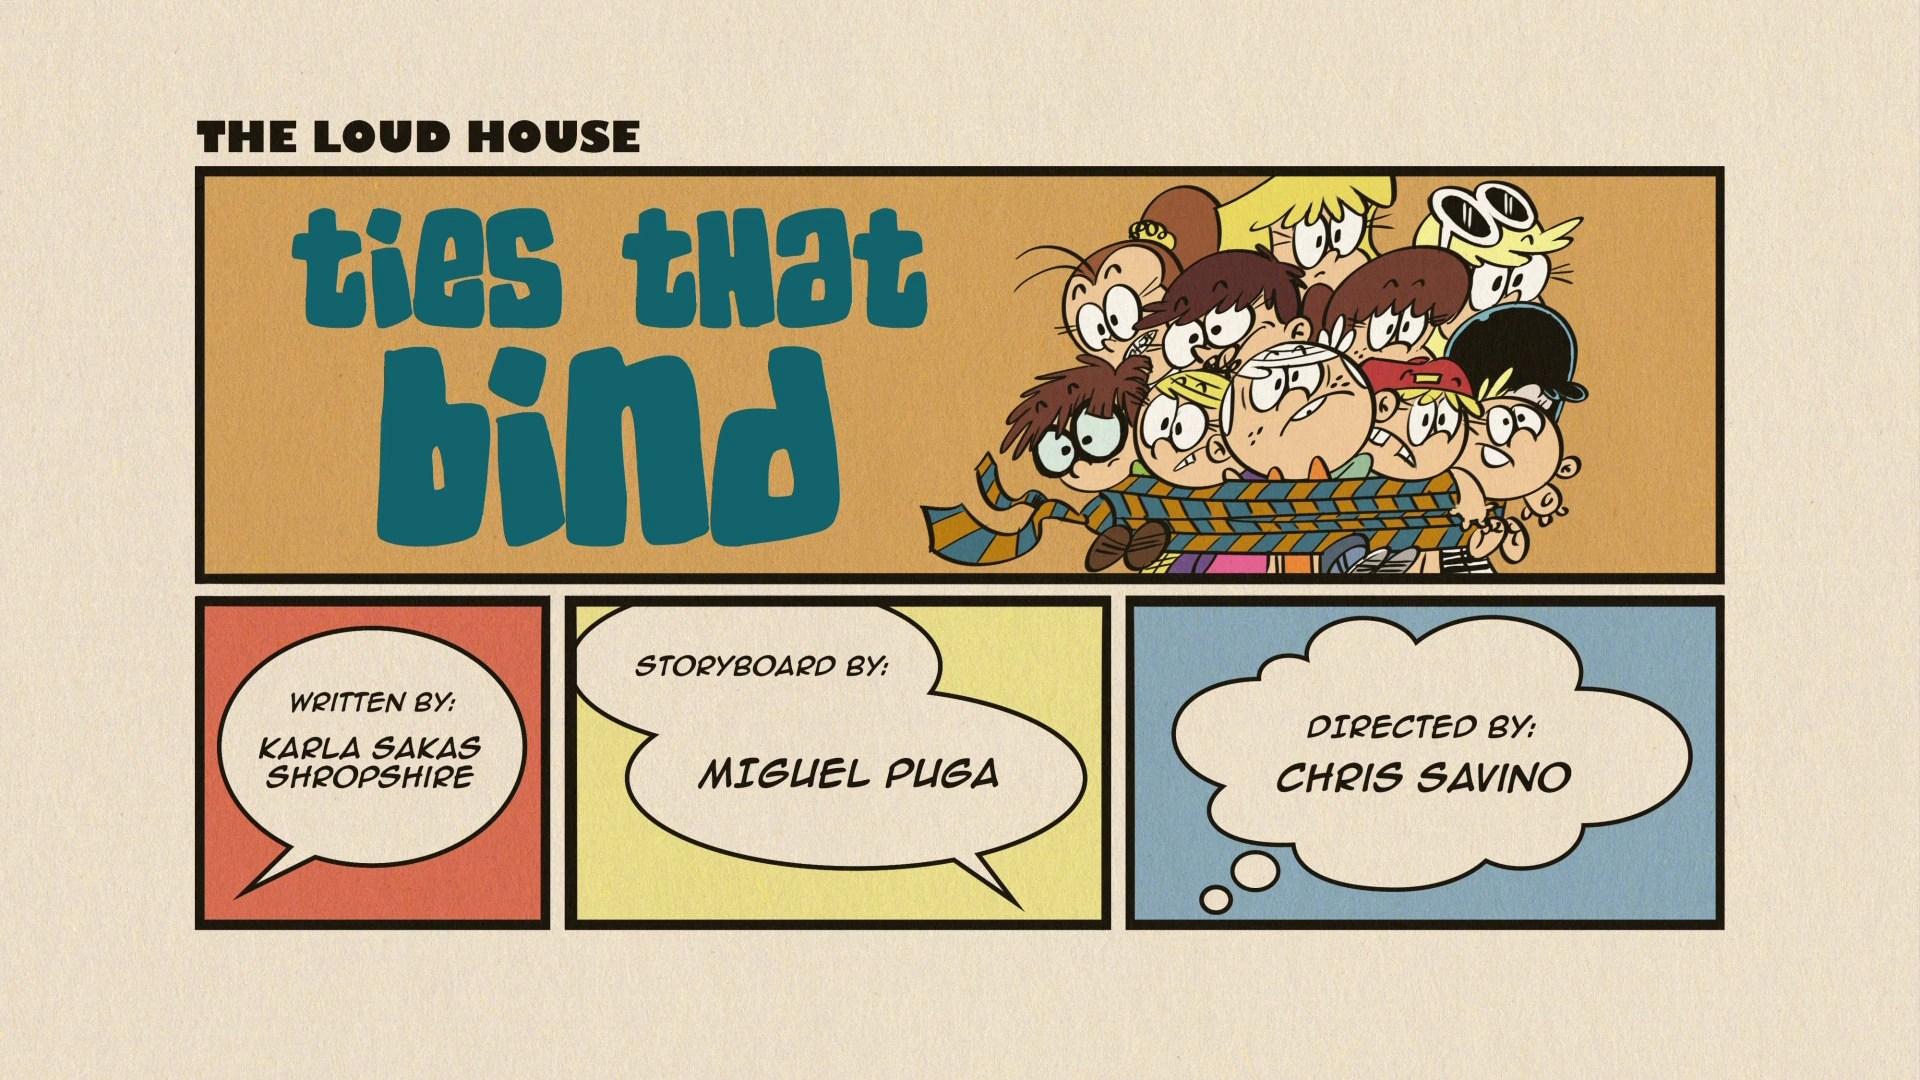 Ties That Bind The Loud House Encyclopedia FANDOM